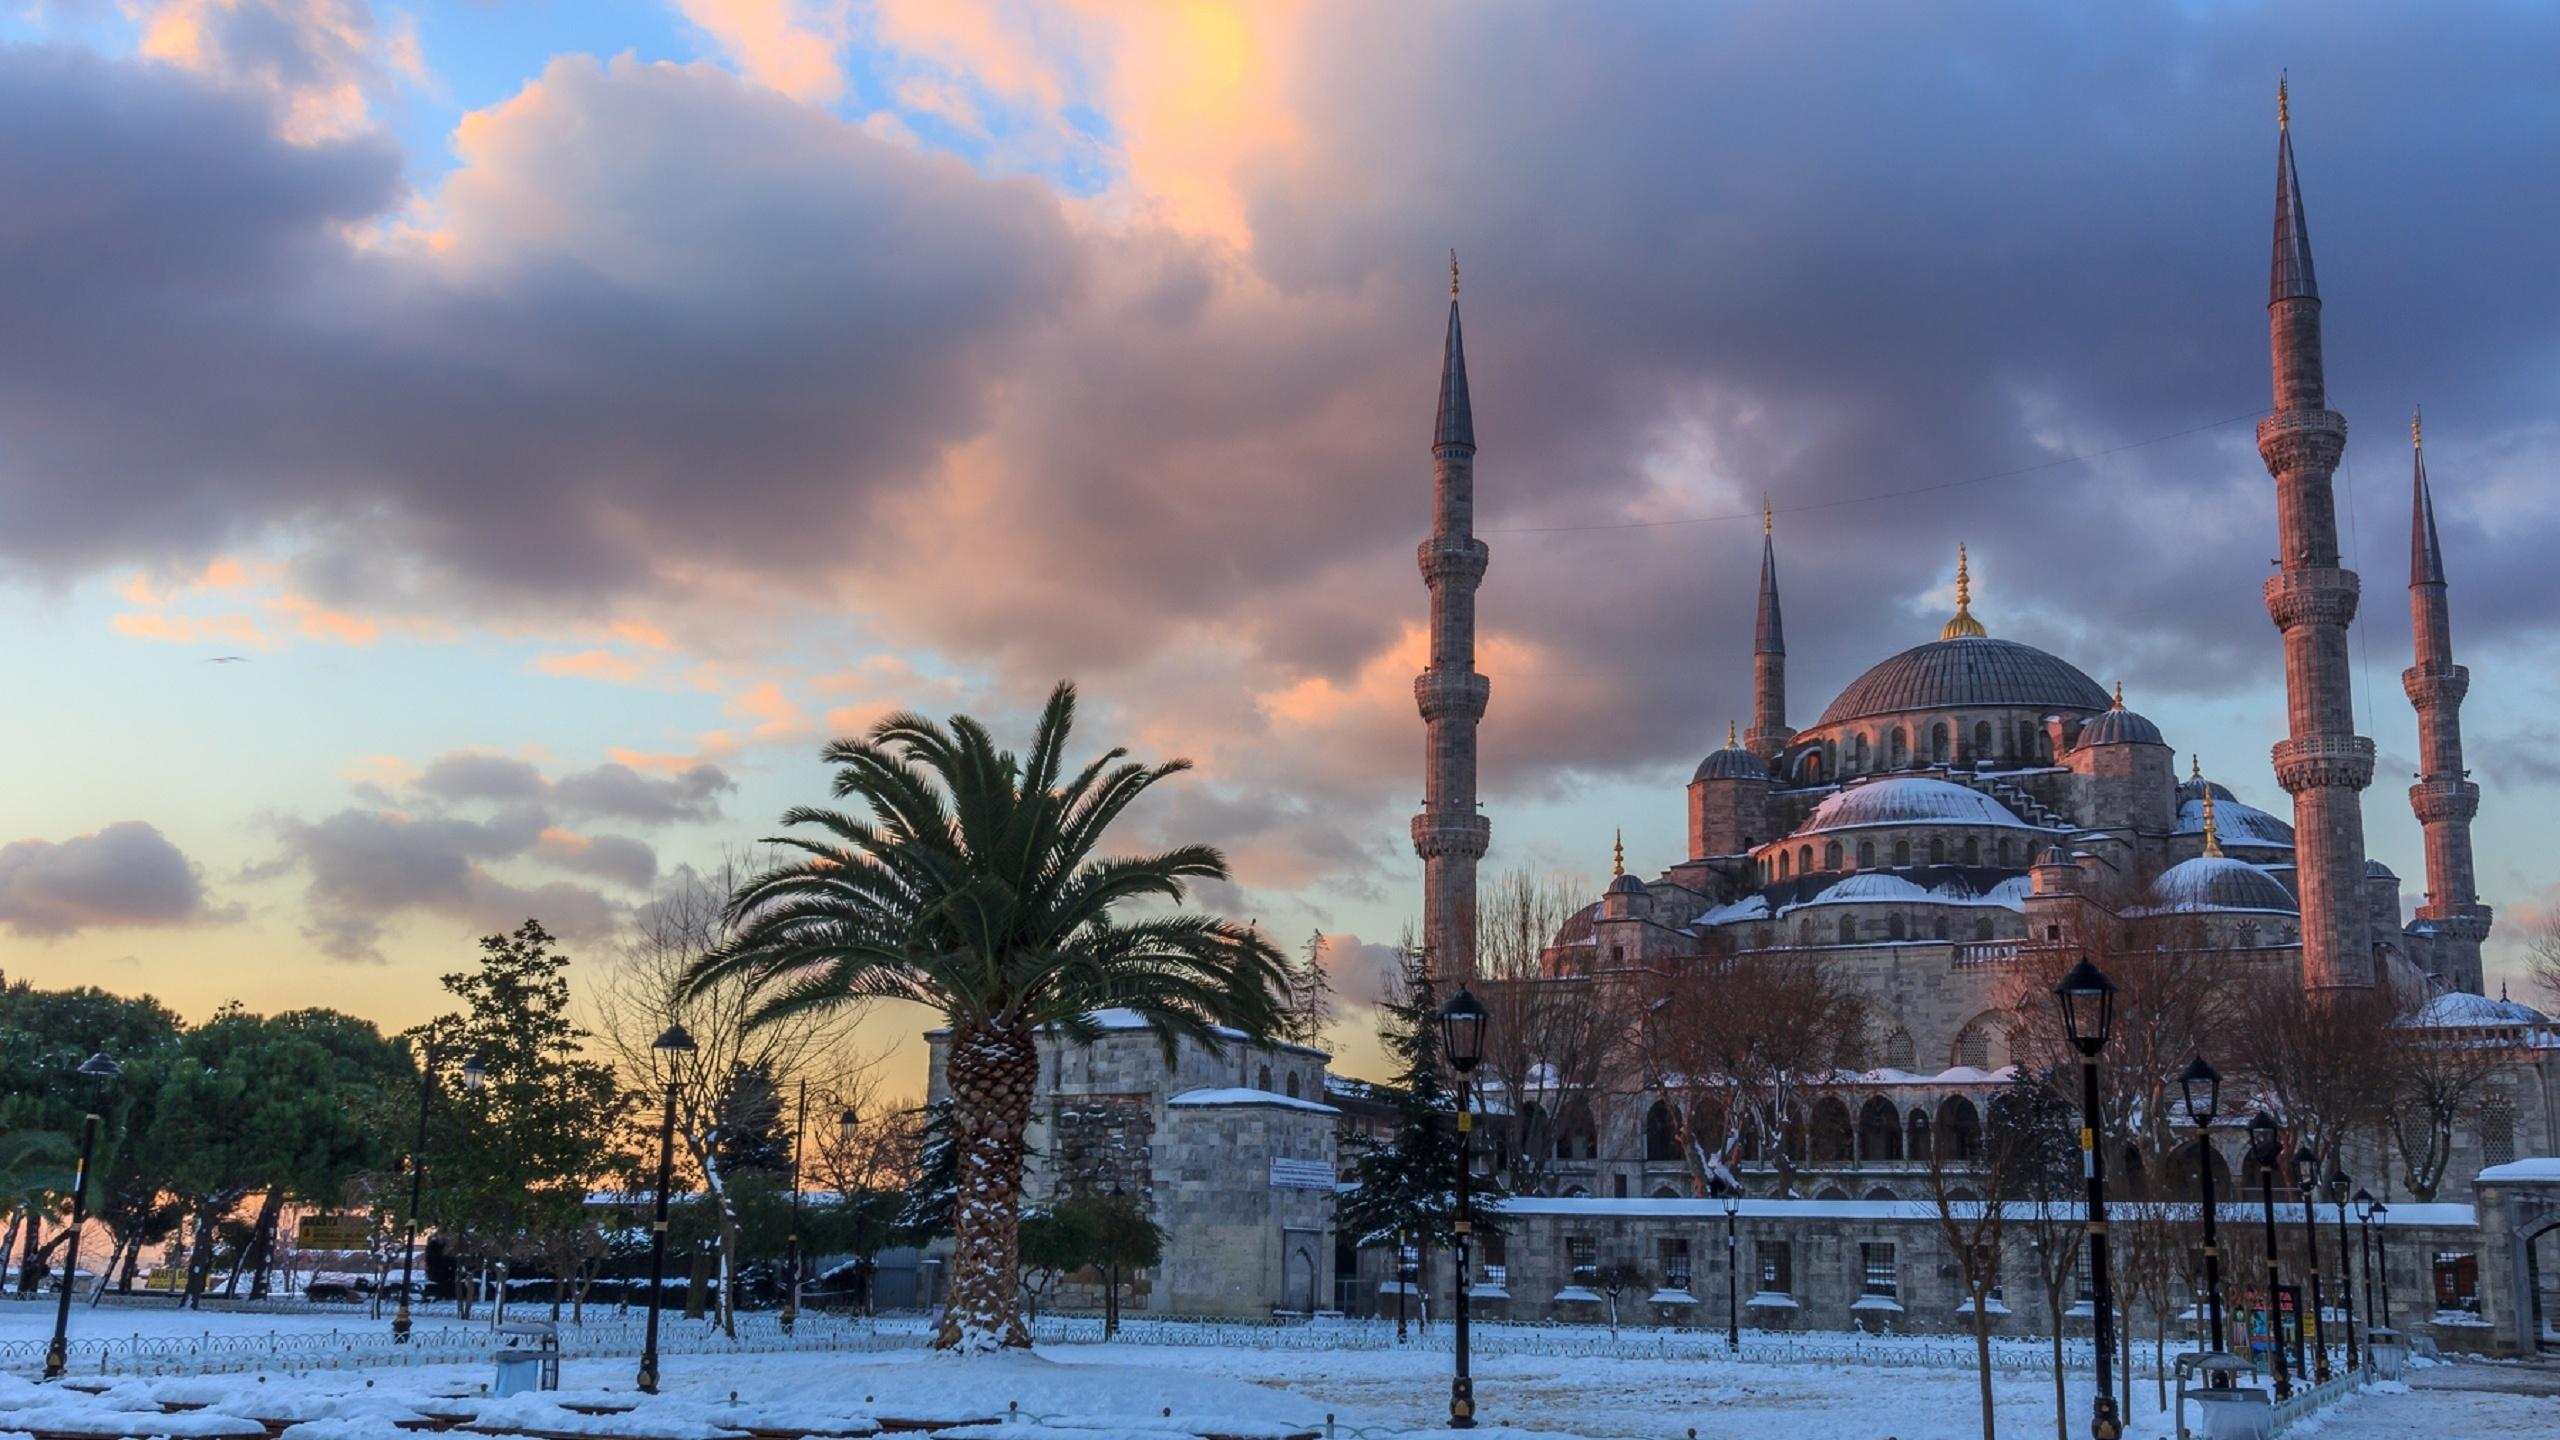 голубая мечеть, стамбул, турция, султанахмет, by сергей гарифуллин